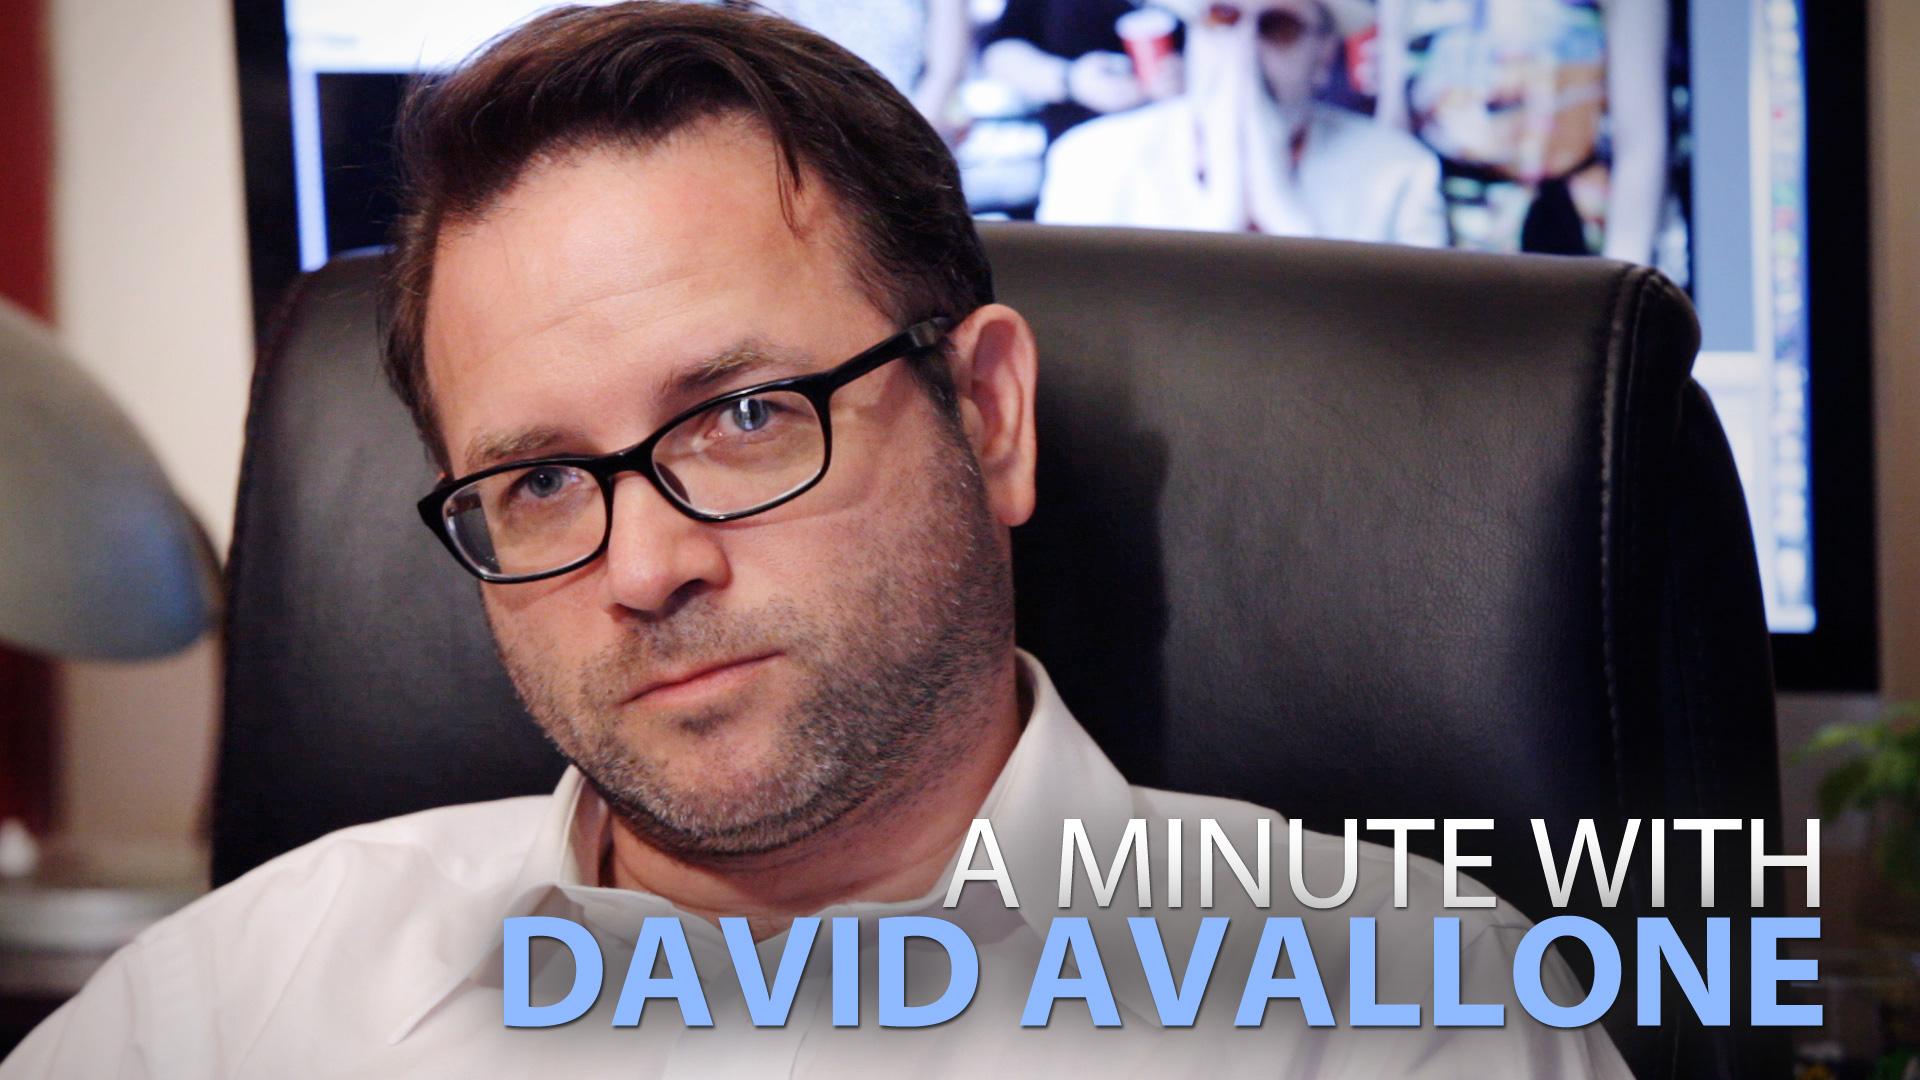 David Avallone Net Worth